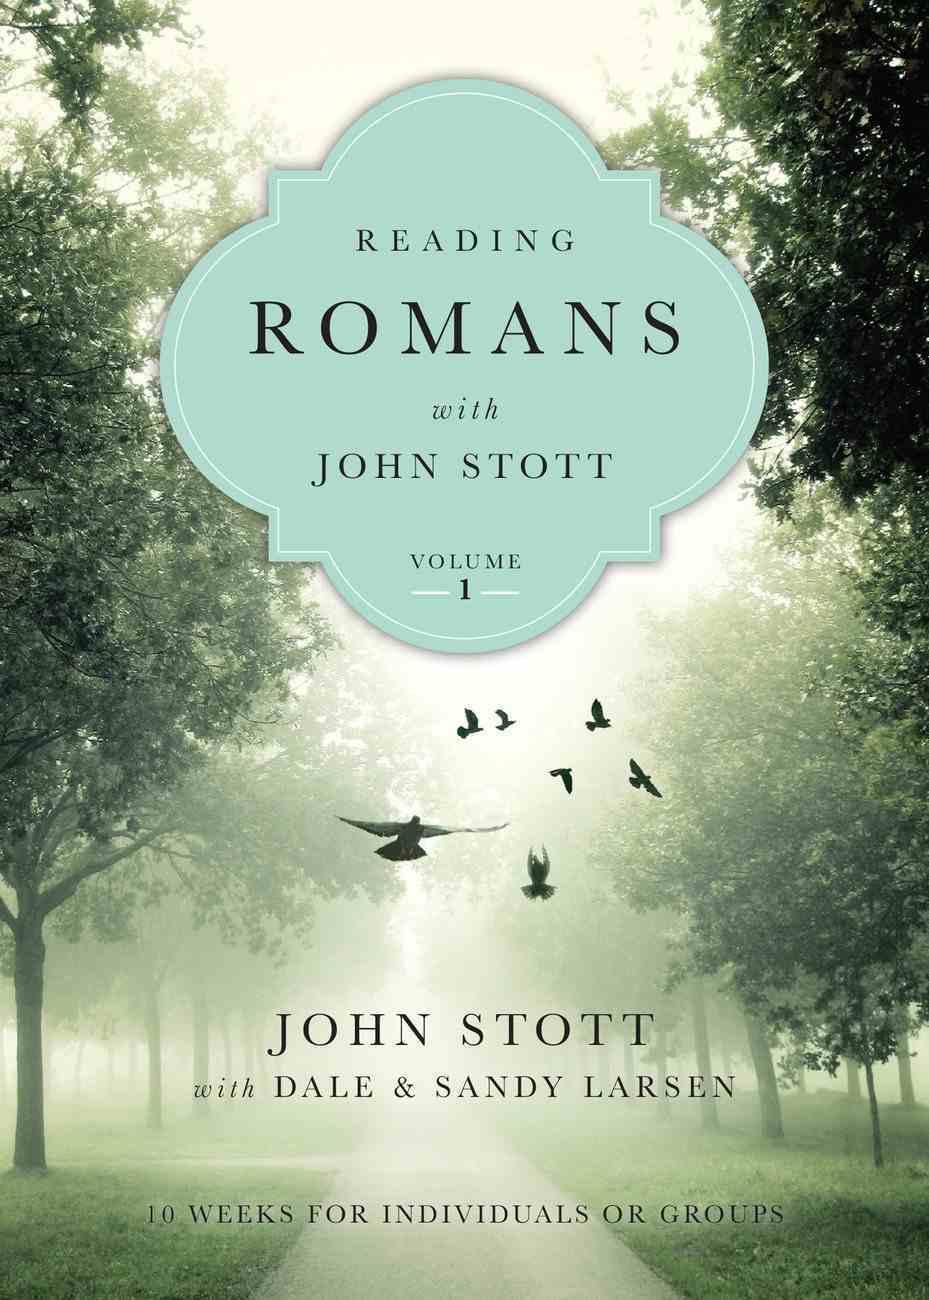 Reading Romans With John Stott, Vol. 1 (Reading The Bible With John Stott Series) eBook